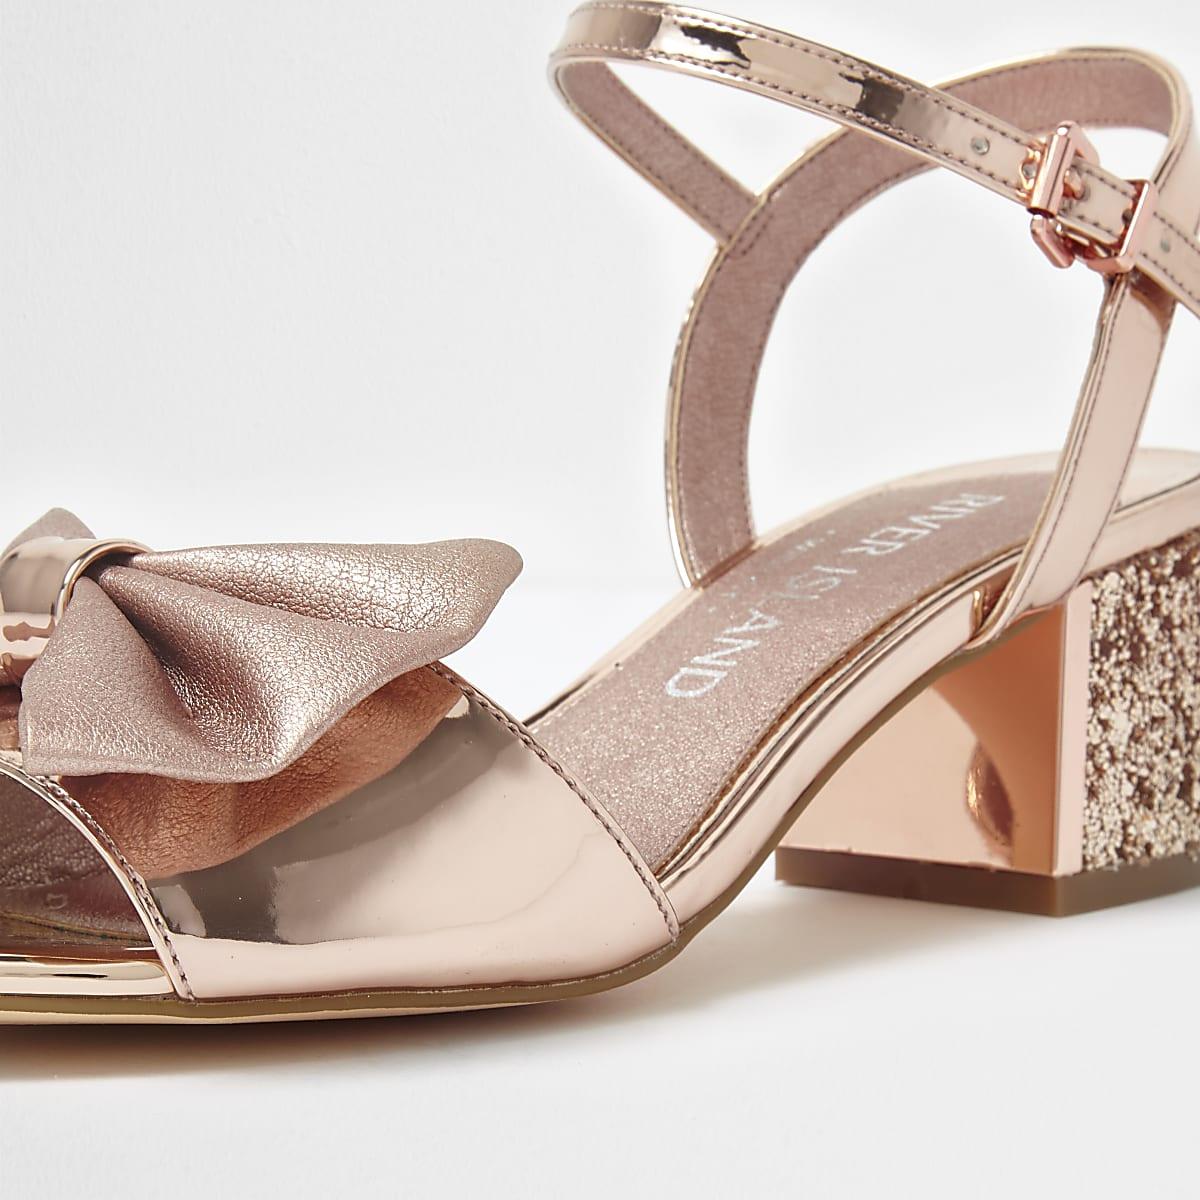 232459e6136 Gold bow wide fit glitter block heel sandals - Sandals - Shoes ...